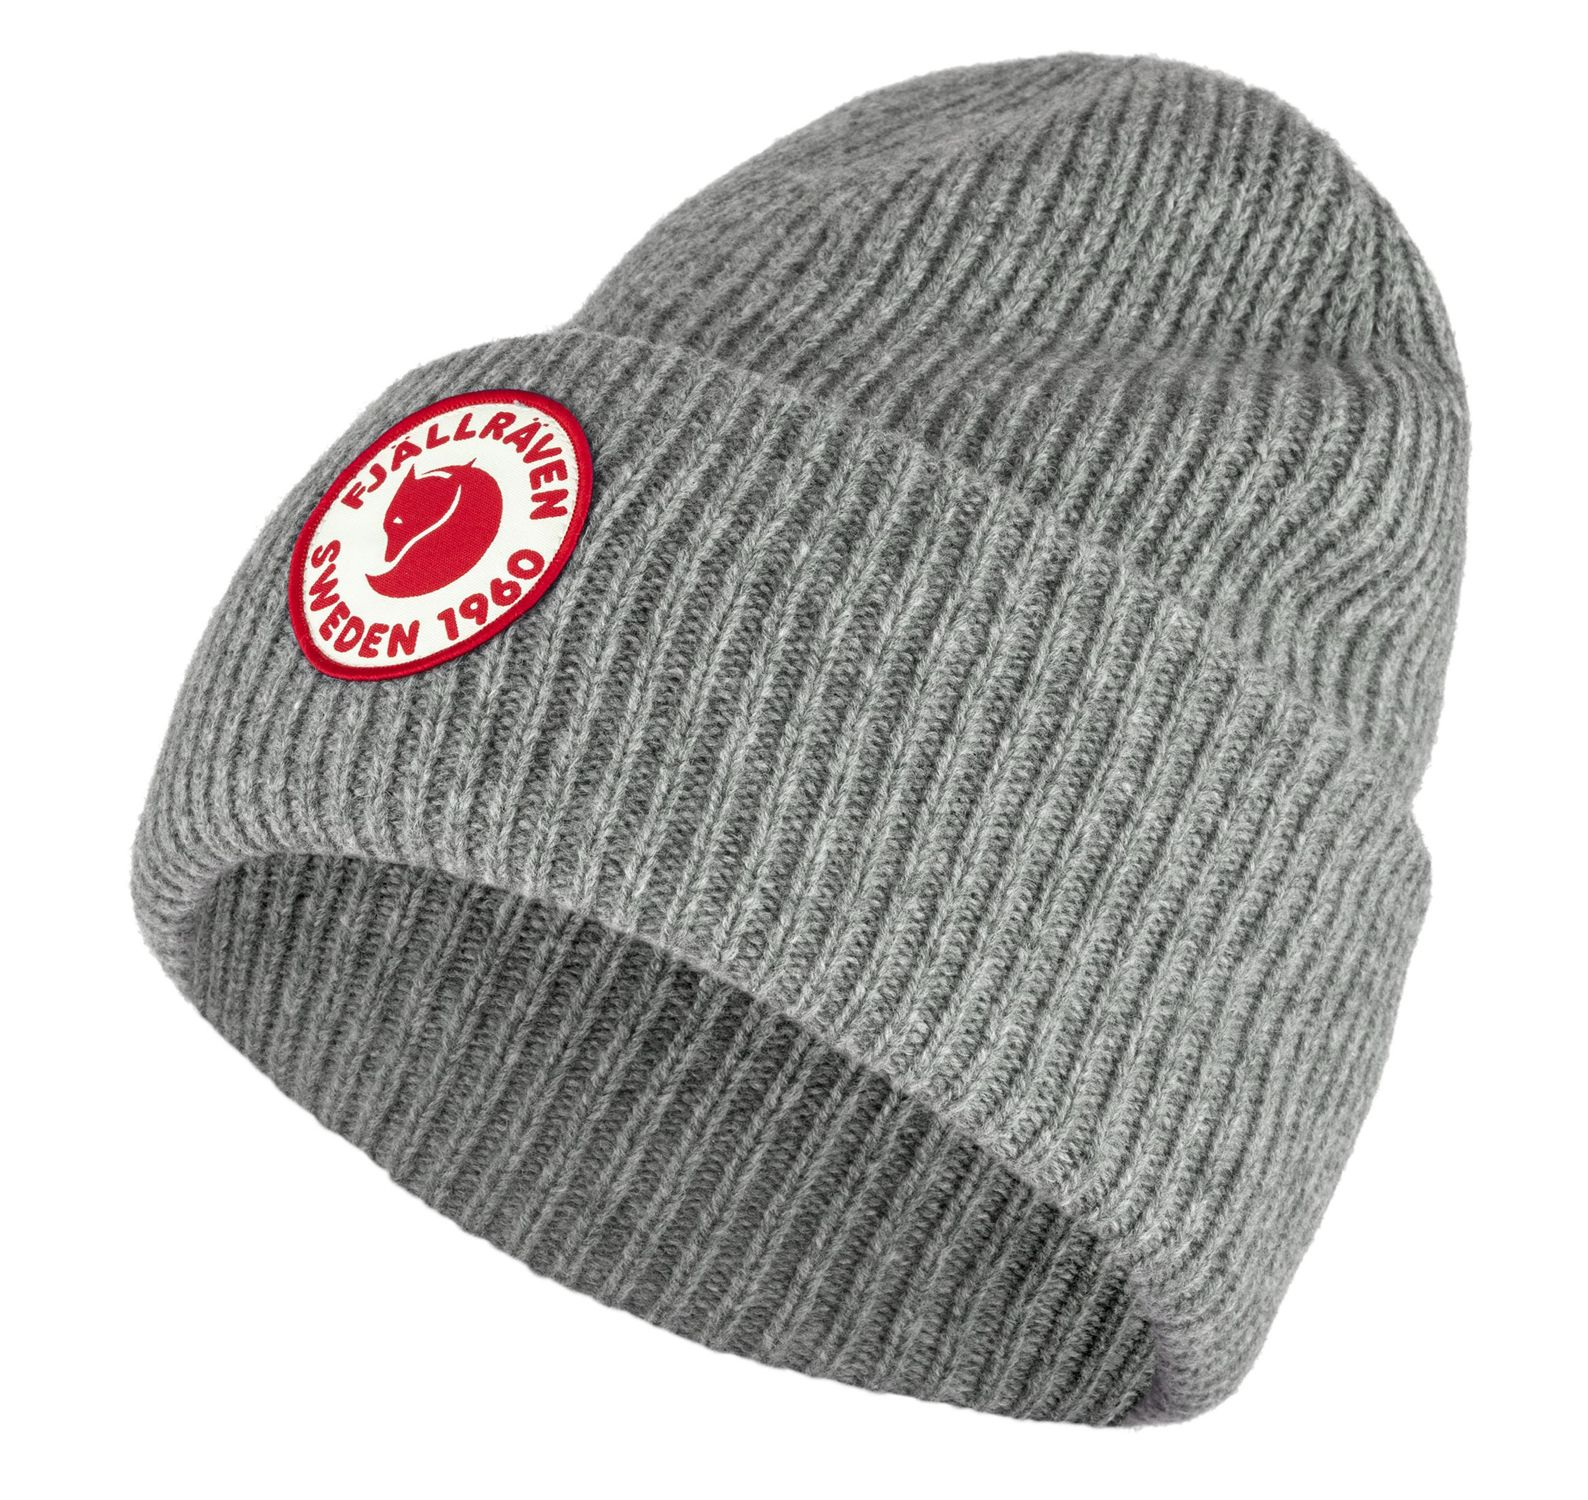 1960 Logo Hat, Grey, Onesize,  Fjällräven